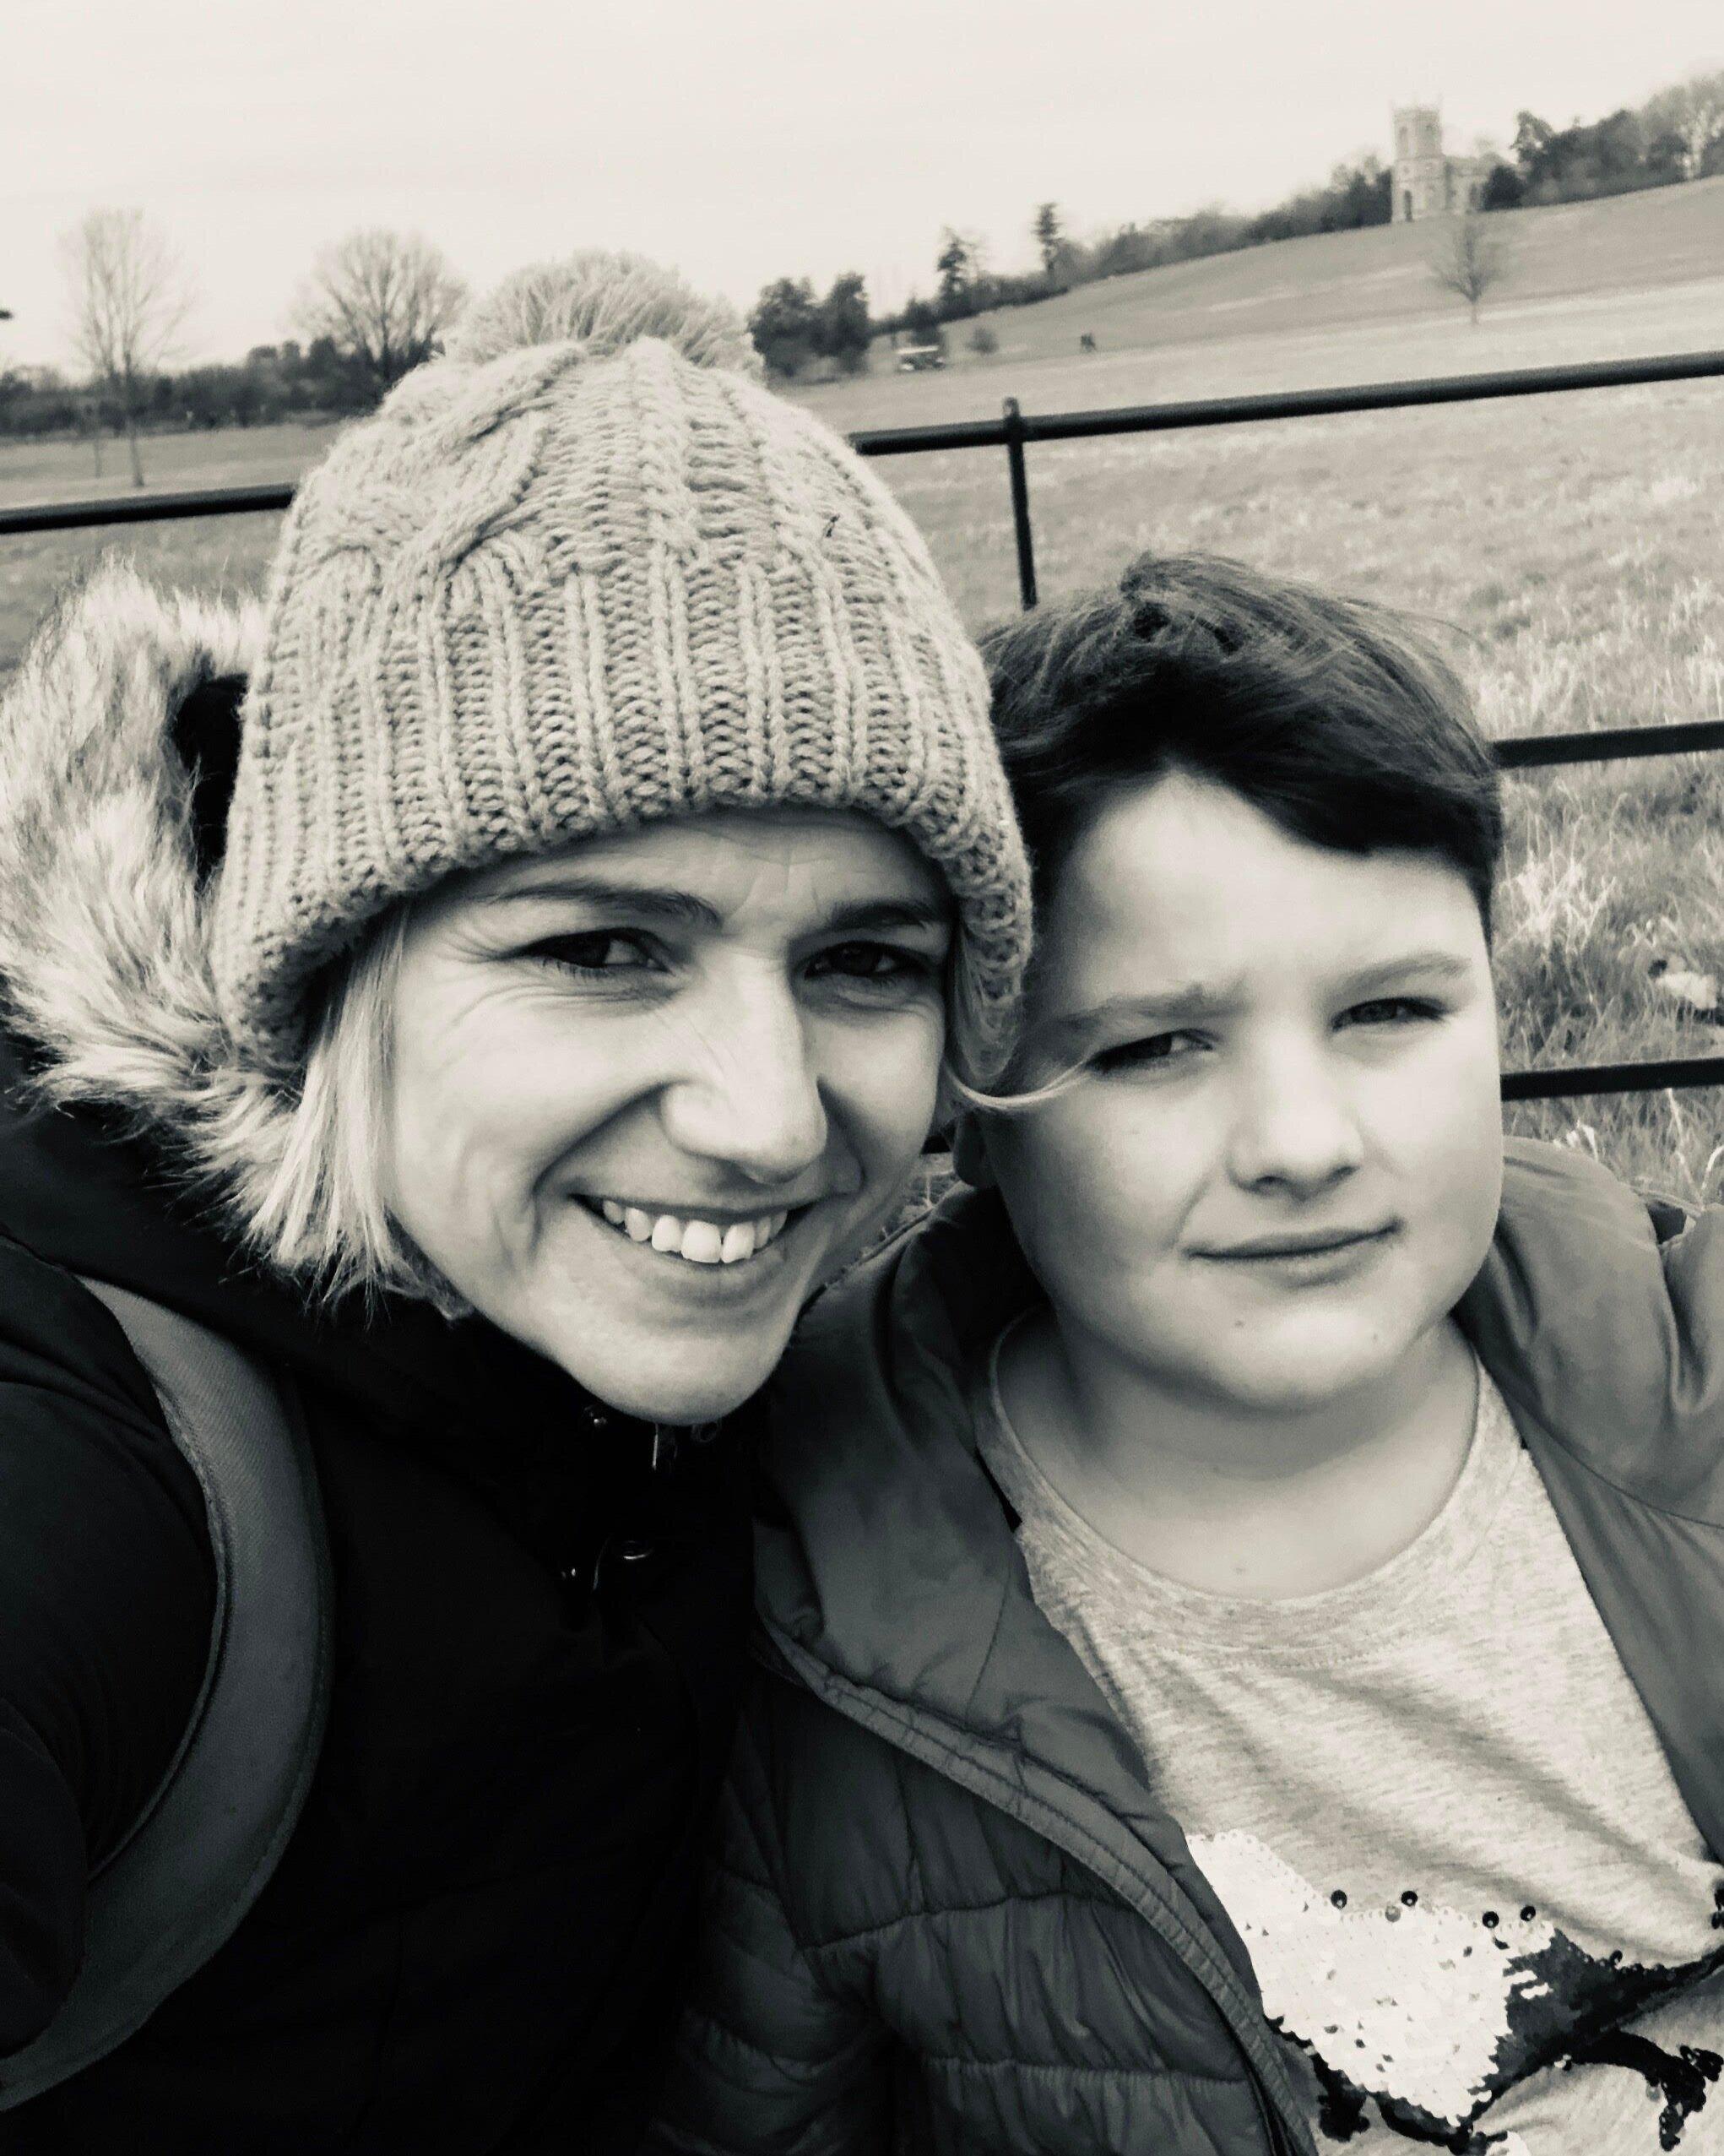 Vicki Buchalik and her son, Jimmy.